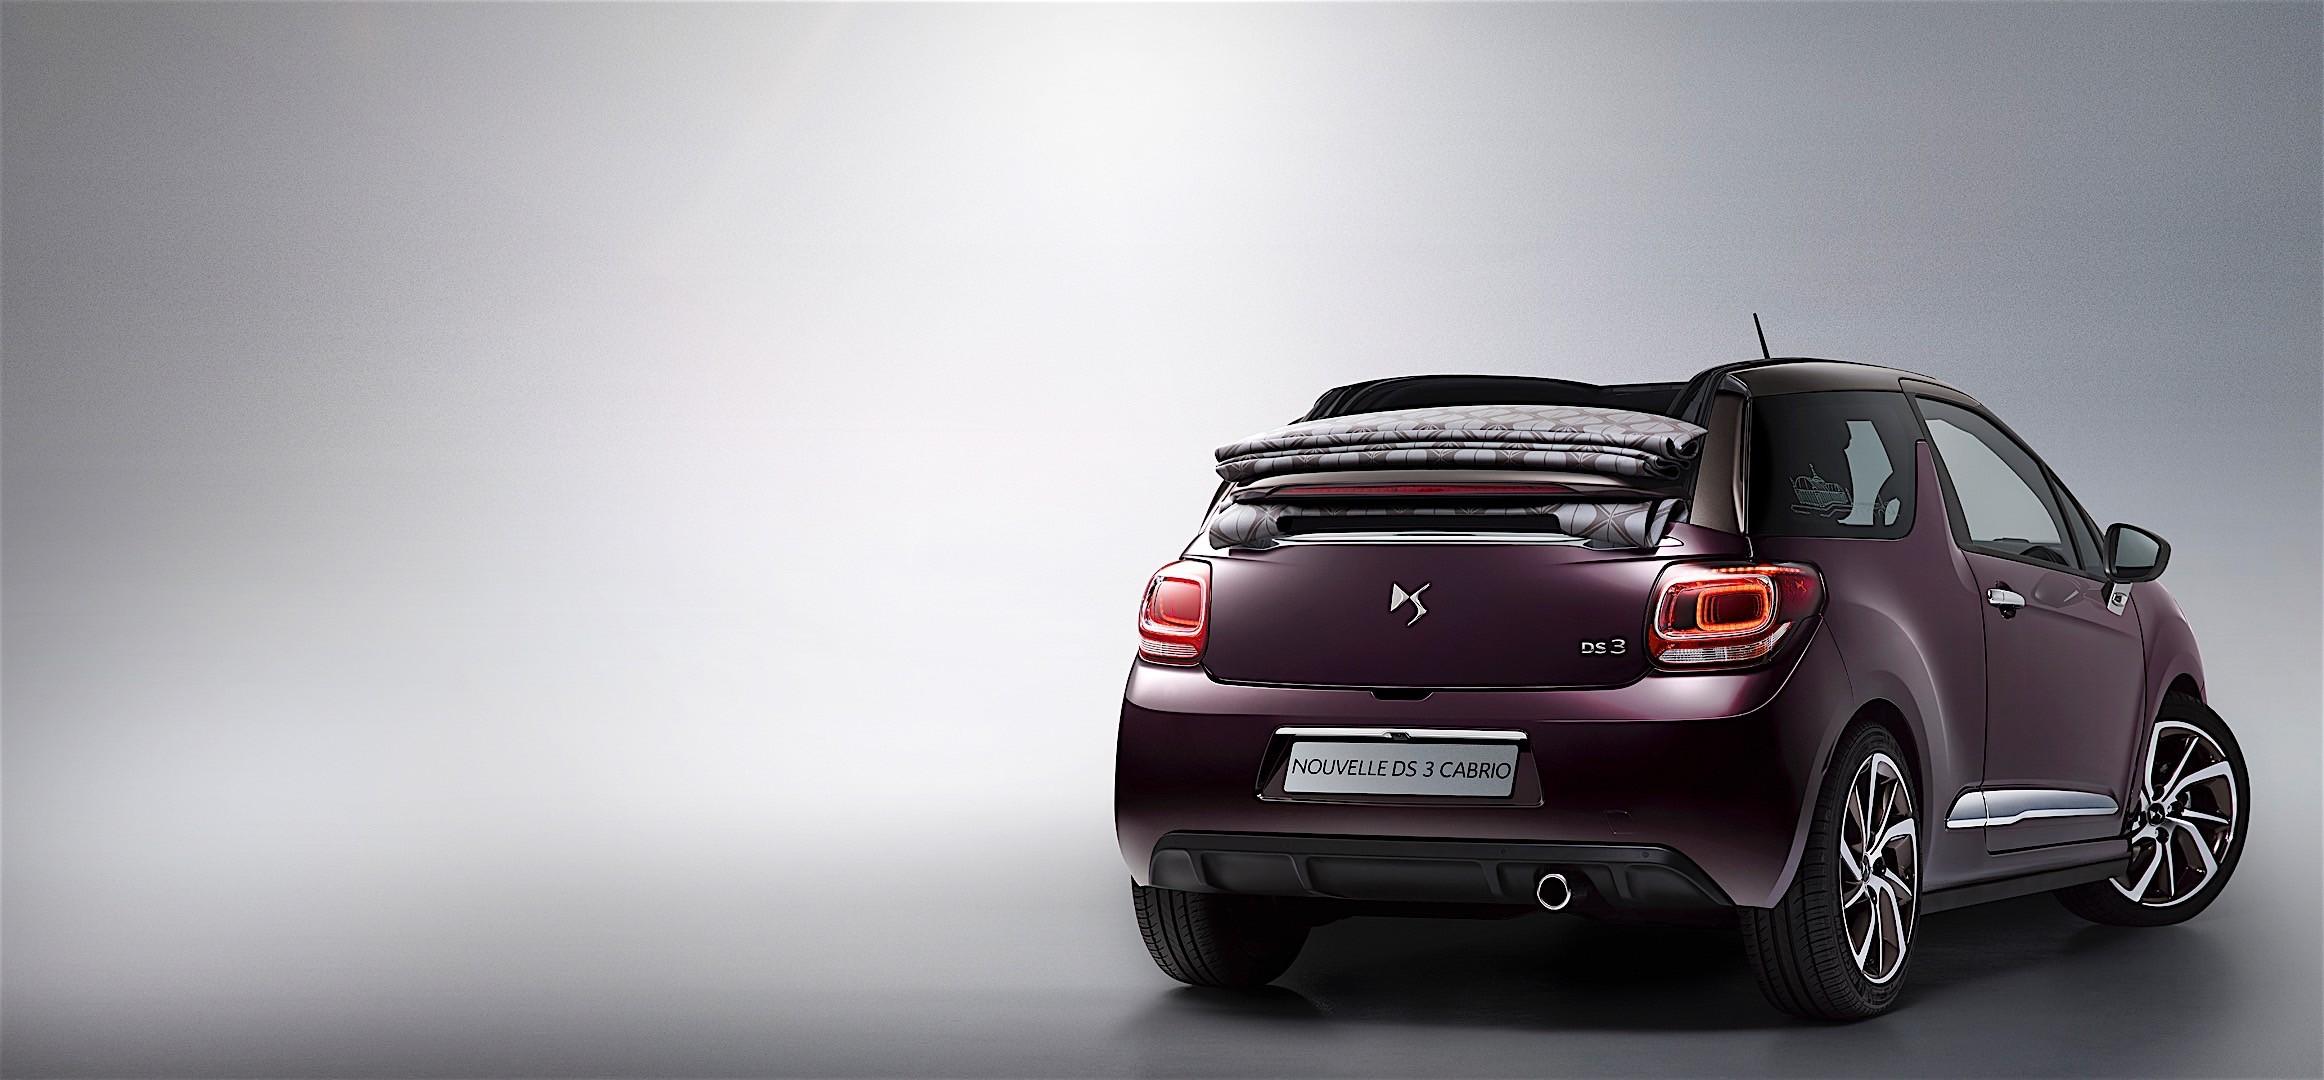 citroen ds3 cabrio 2016 autoevolution. Black Bedroom Furniture Sets. Home Design Ideas